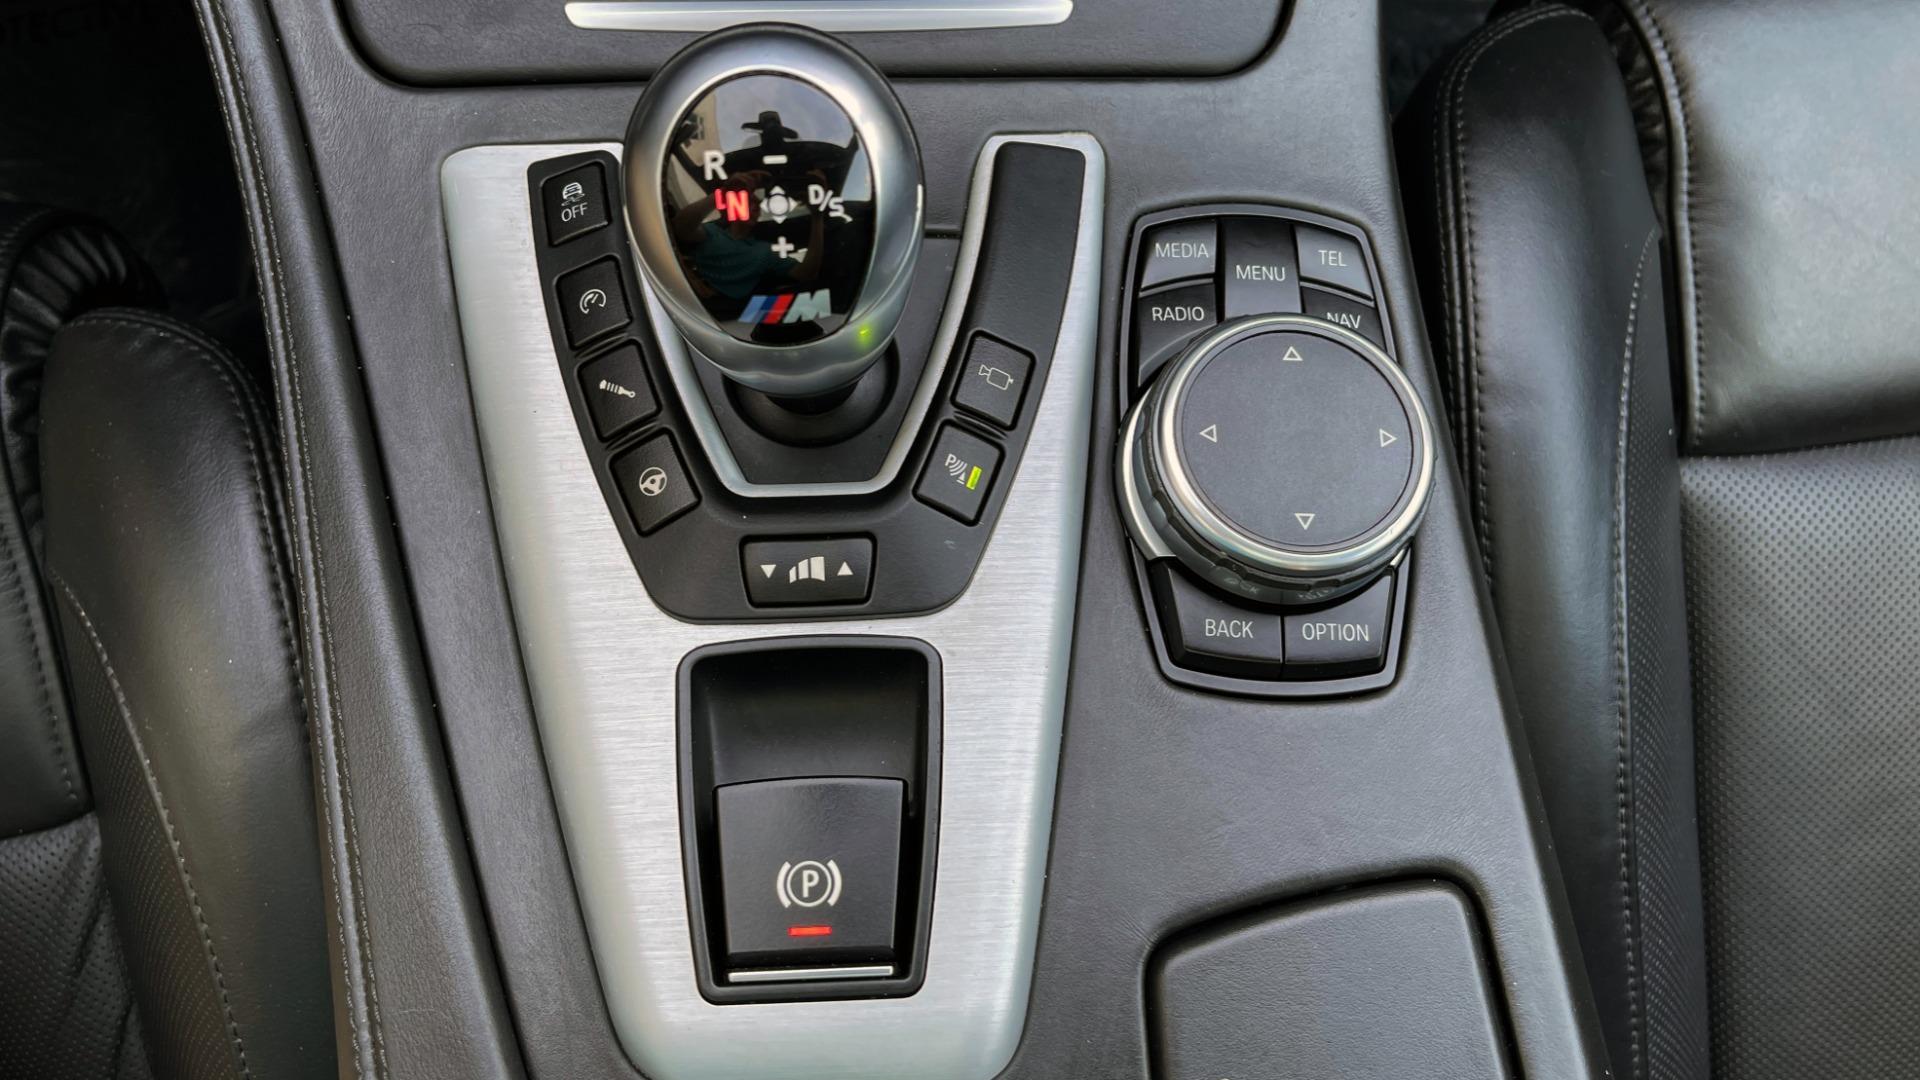 Used 2015 BMW M5 SEDAN / EXEC PKG / HUD / NAV / B&O SND / SUNROOF / REARVIEW for sale Sold at Formula Imports in Charlotte NC 28227 68